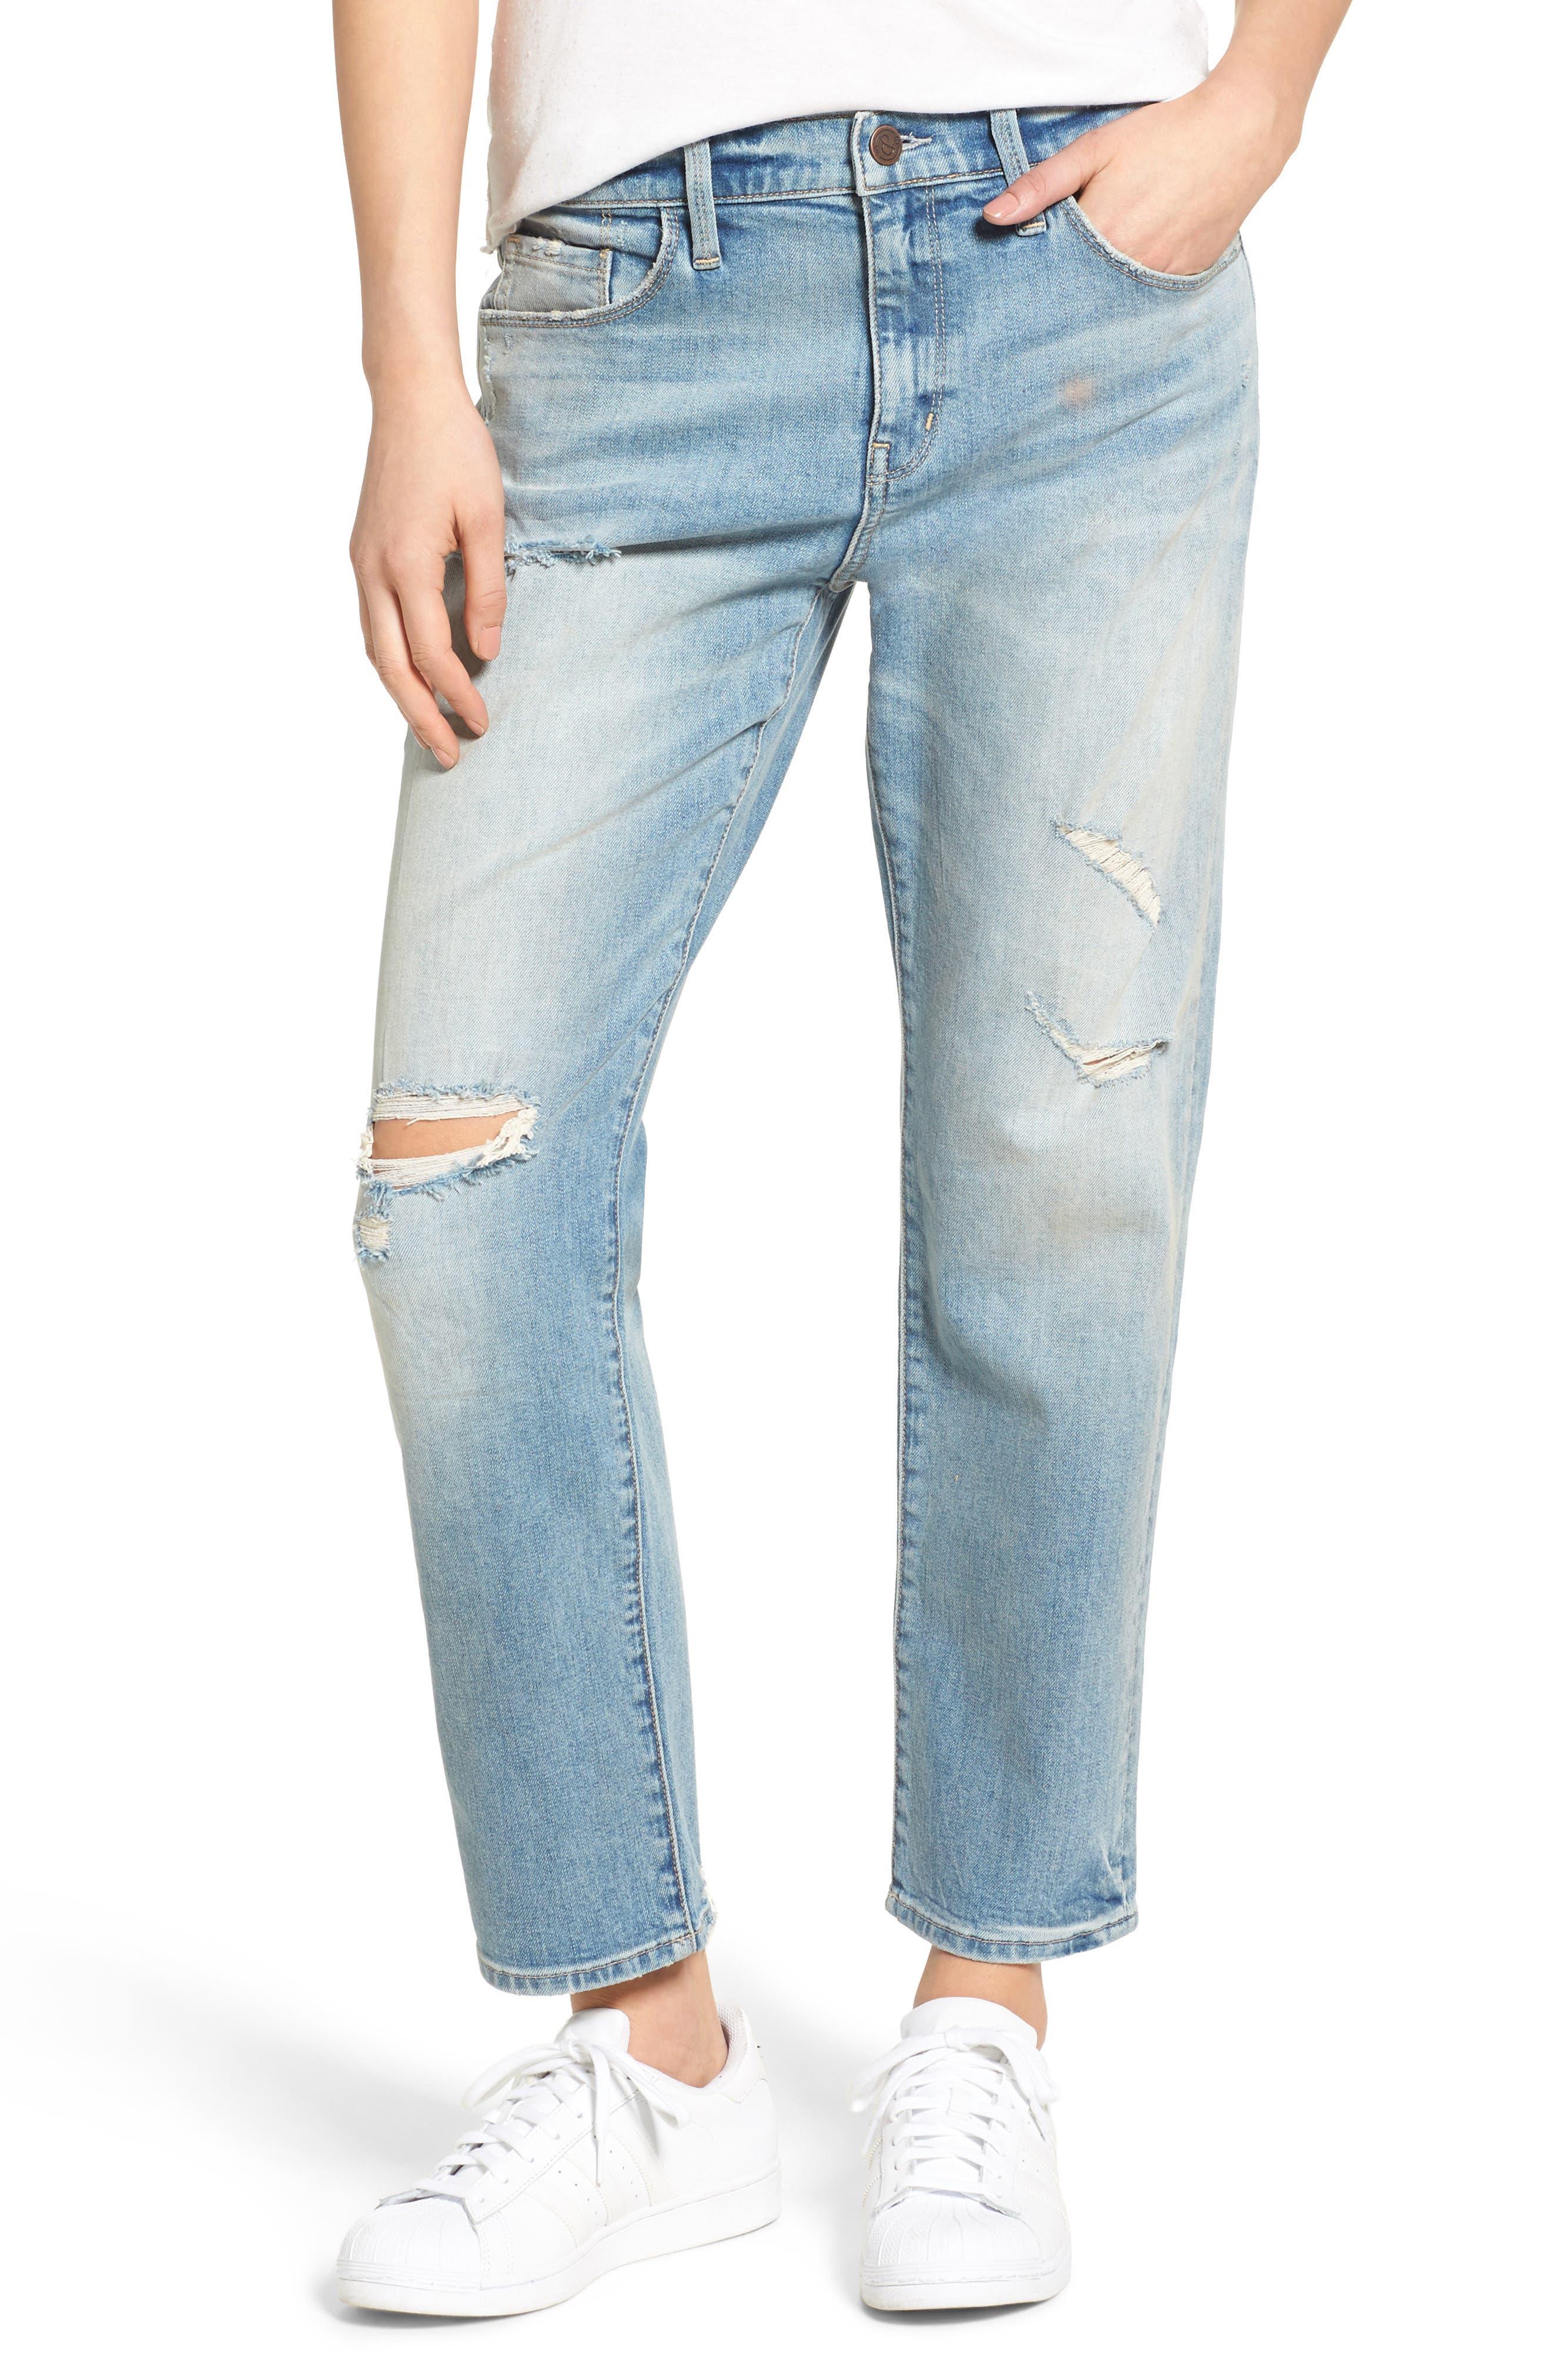 TREASURE & BOND Boyfriend Jeans, Main, color, 400